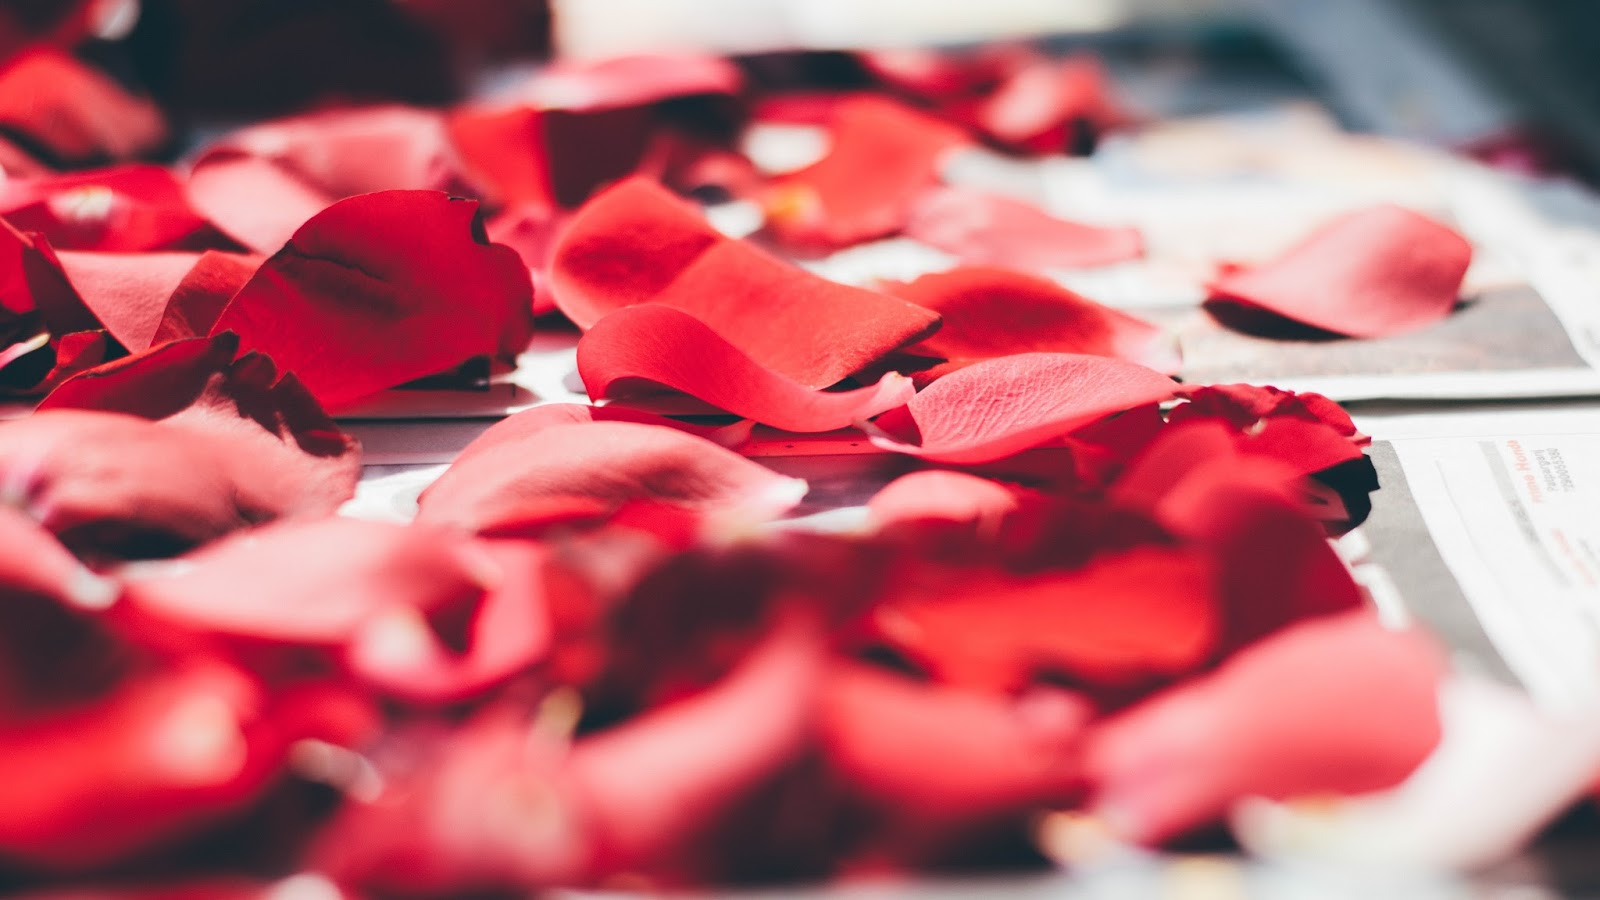 Aus Liebe zum Duft, Parfums, Artistic Parfumes, Lifestyle, Beauty Blog, Beauty Stories, Duft, Niche Parfume, Pitti Fragranze, Parfumerie Möltgen, Lalique, Bulgari, Shalimar